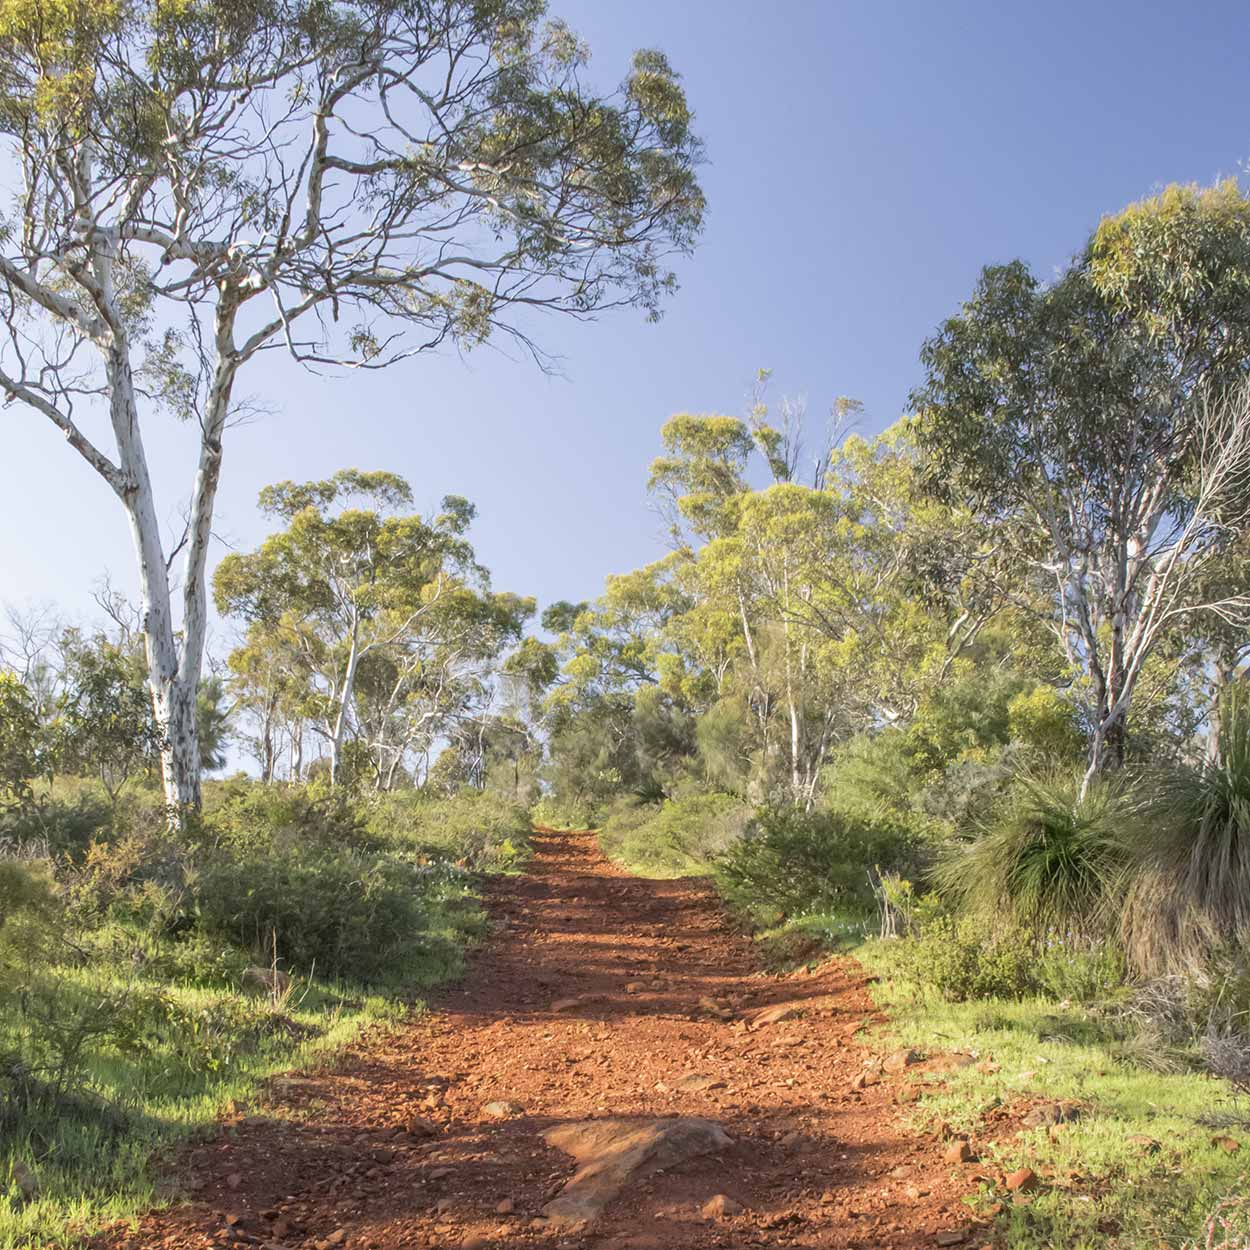 Morning sunshine on the Palm Terrace Walk, Mundy Regional Park, Perth, Western Australia